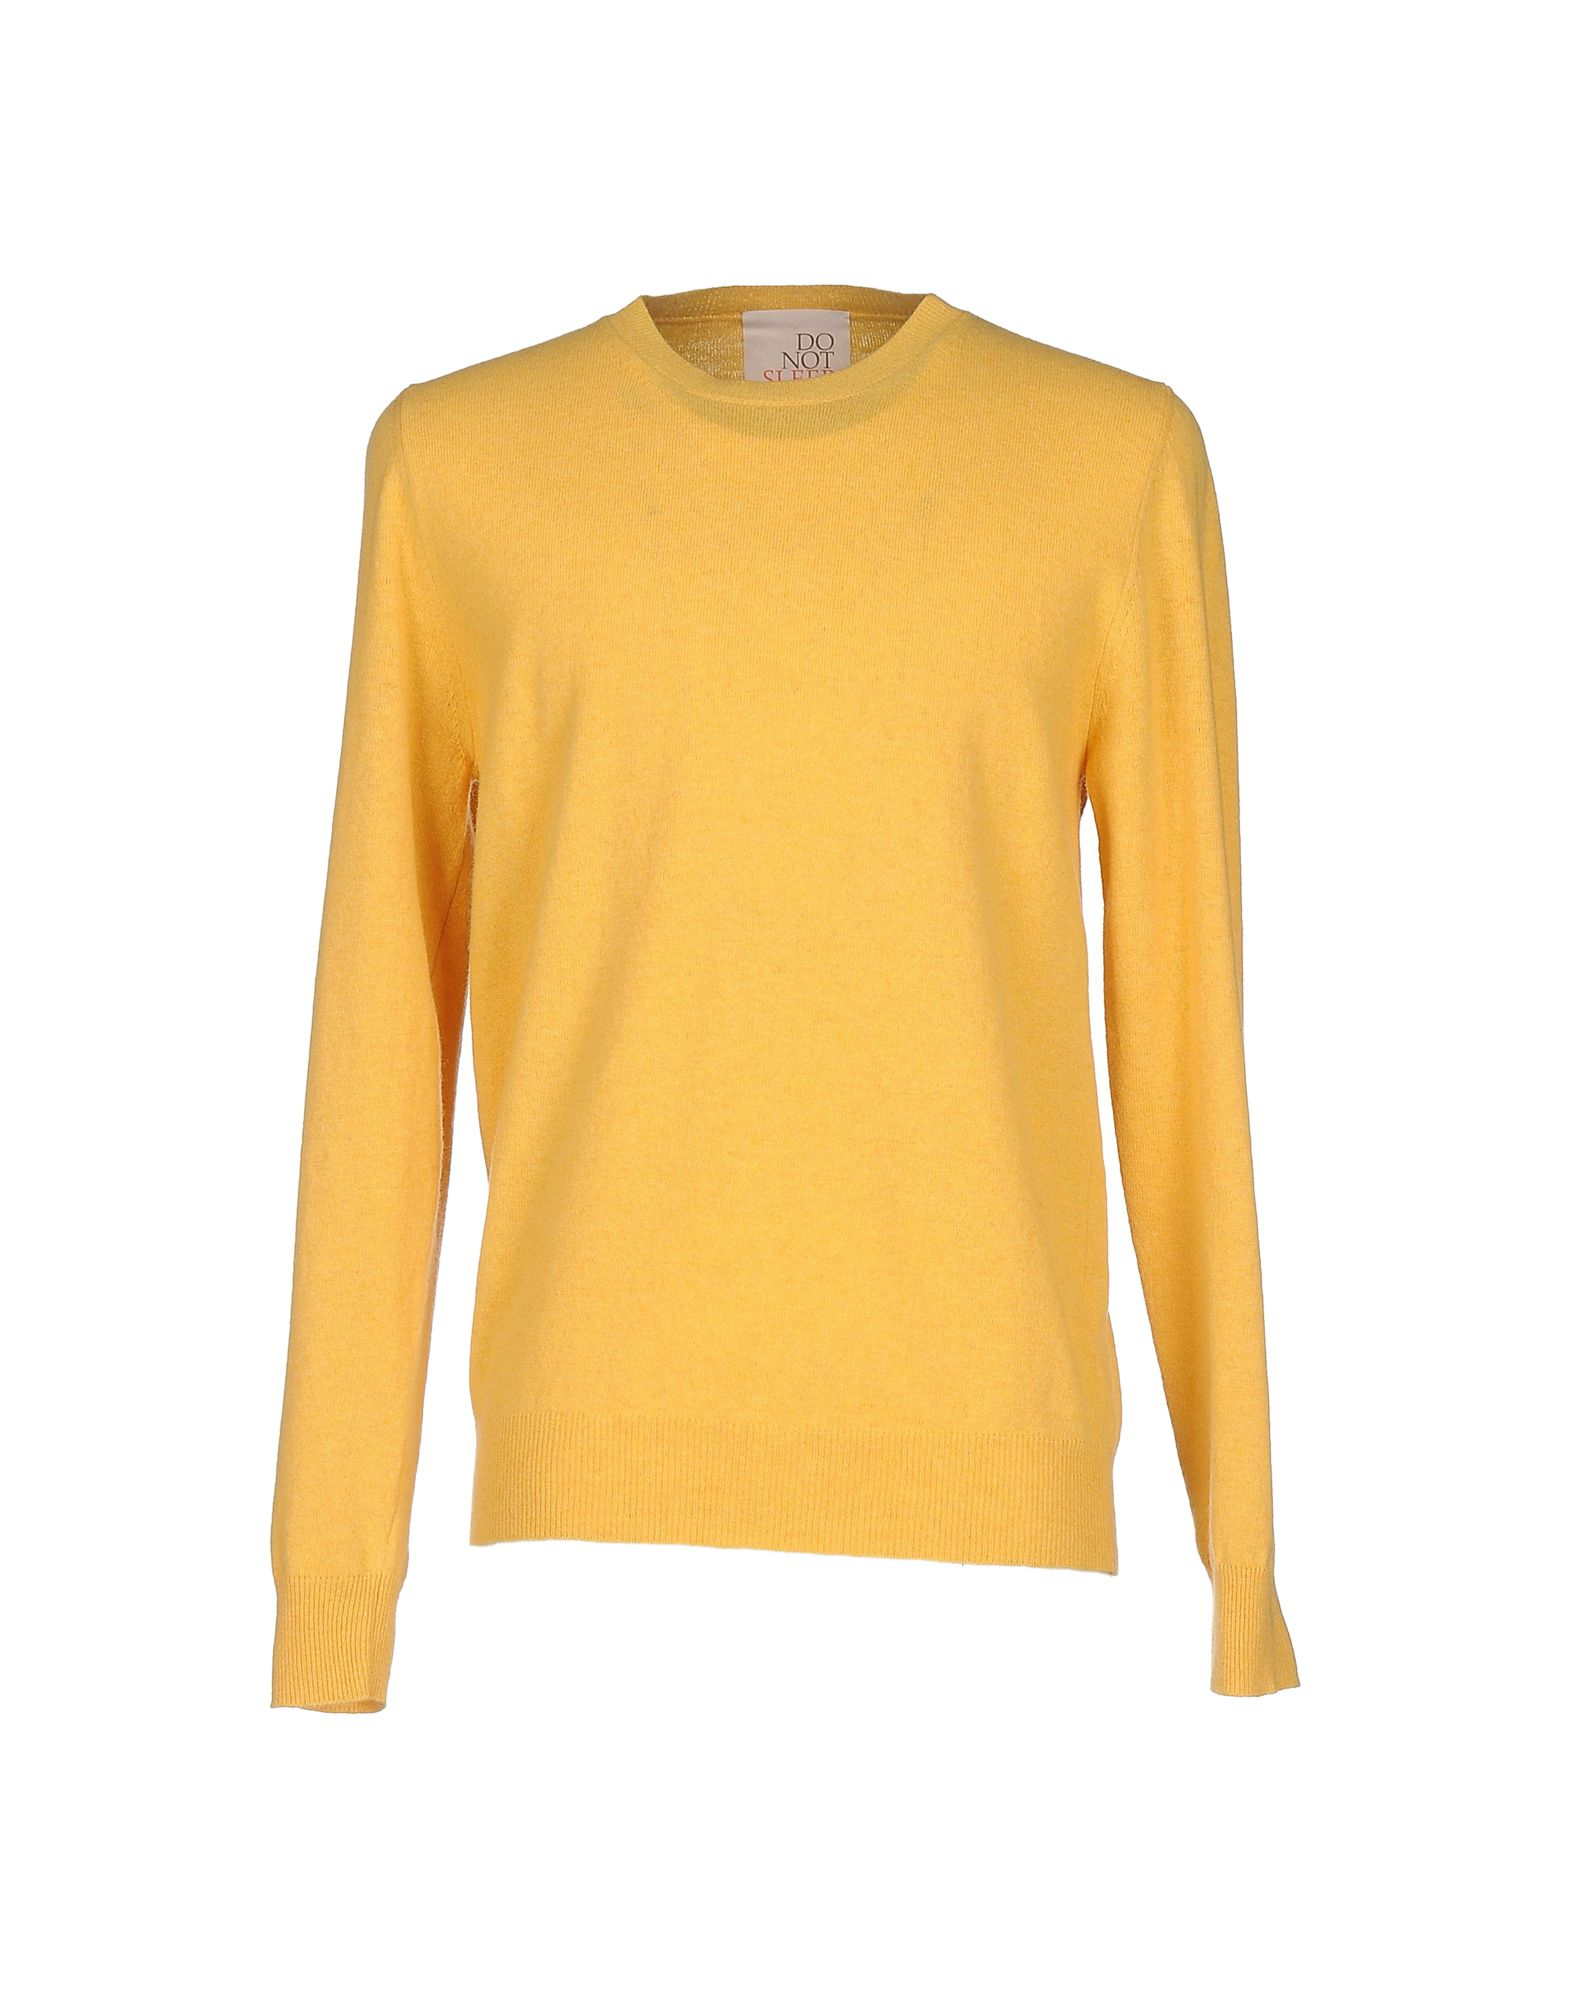 DO NOT SLEEP Sweaters